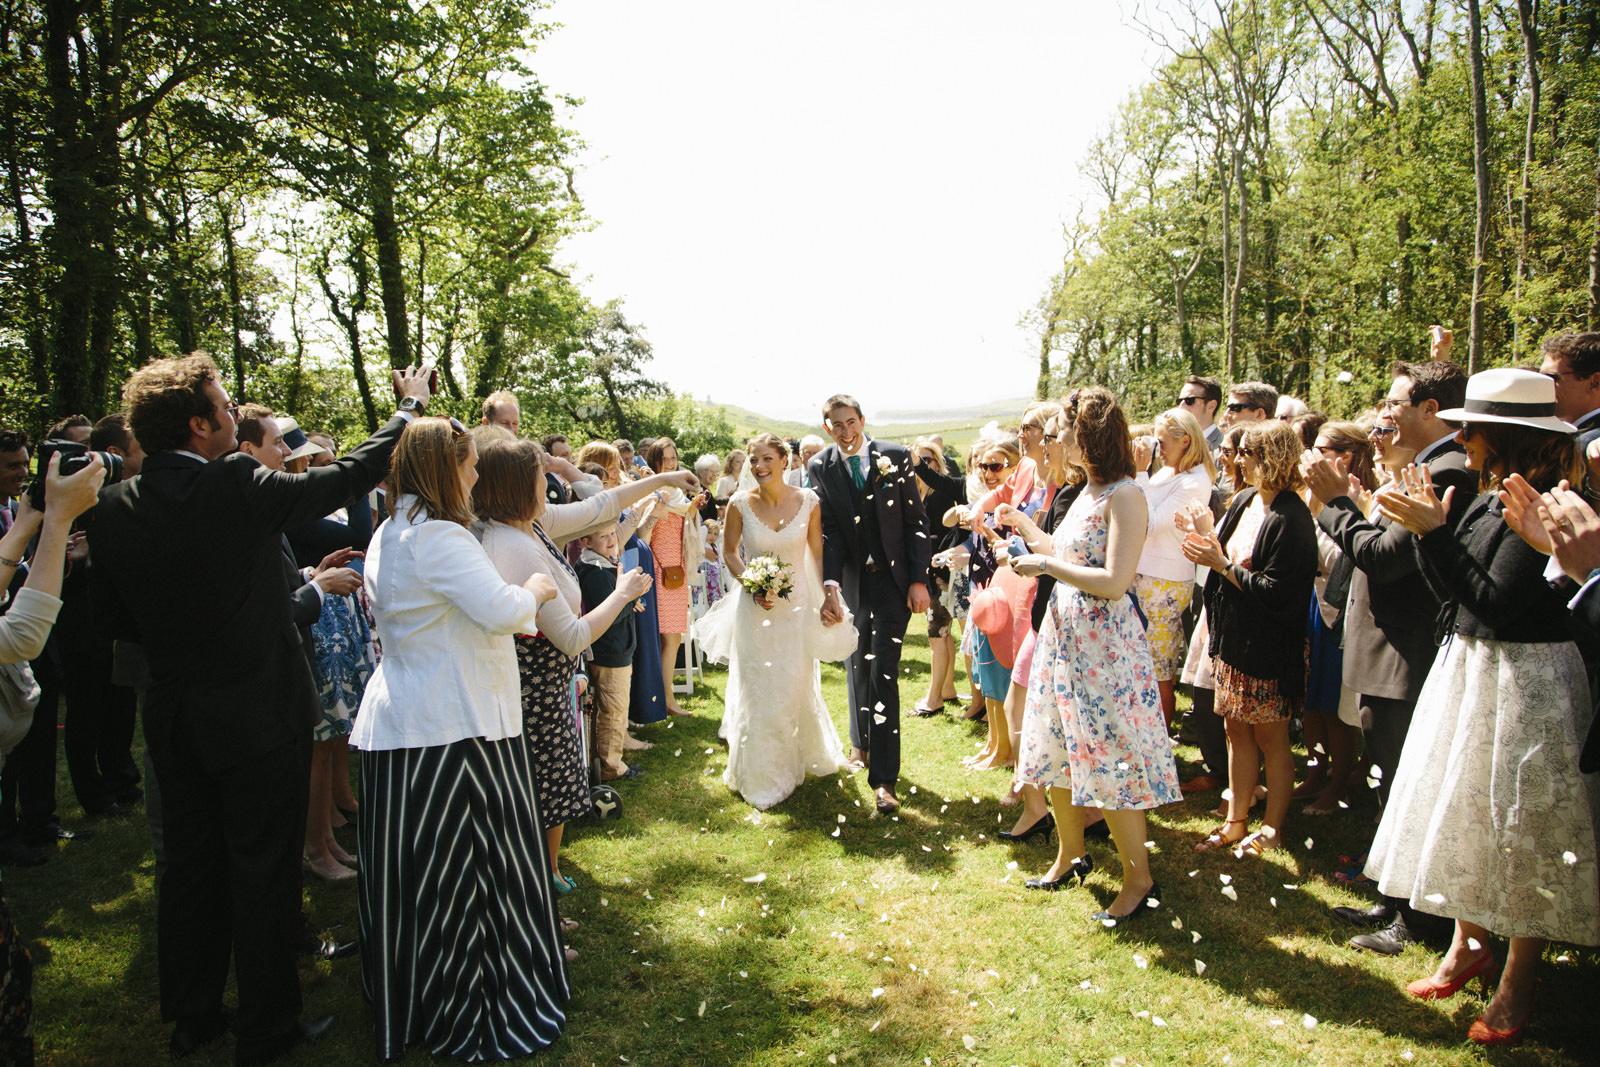 Ian Olsson Wedding Photography Portfolio 2018